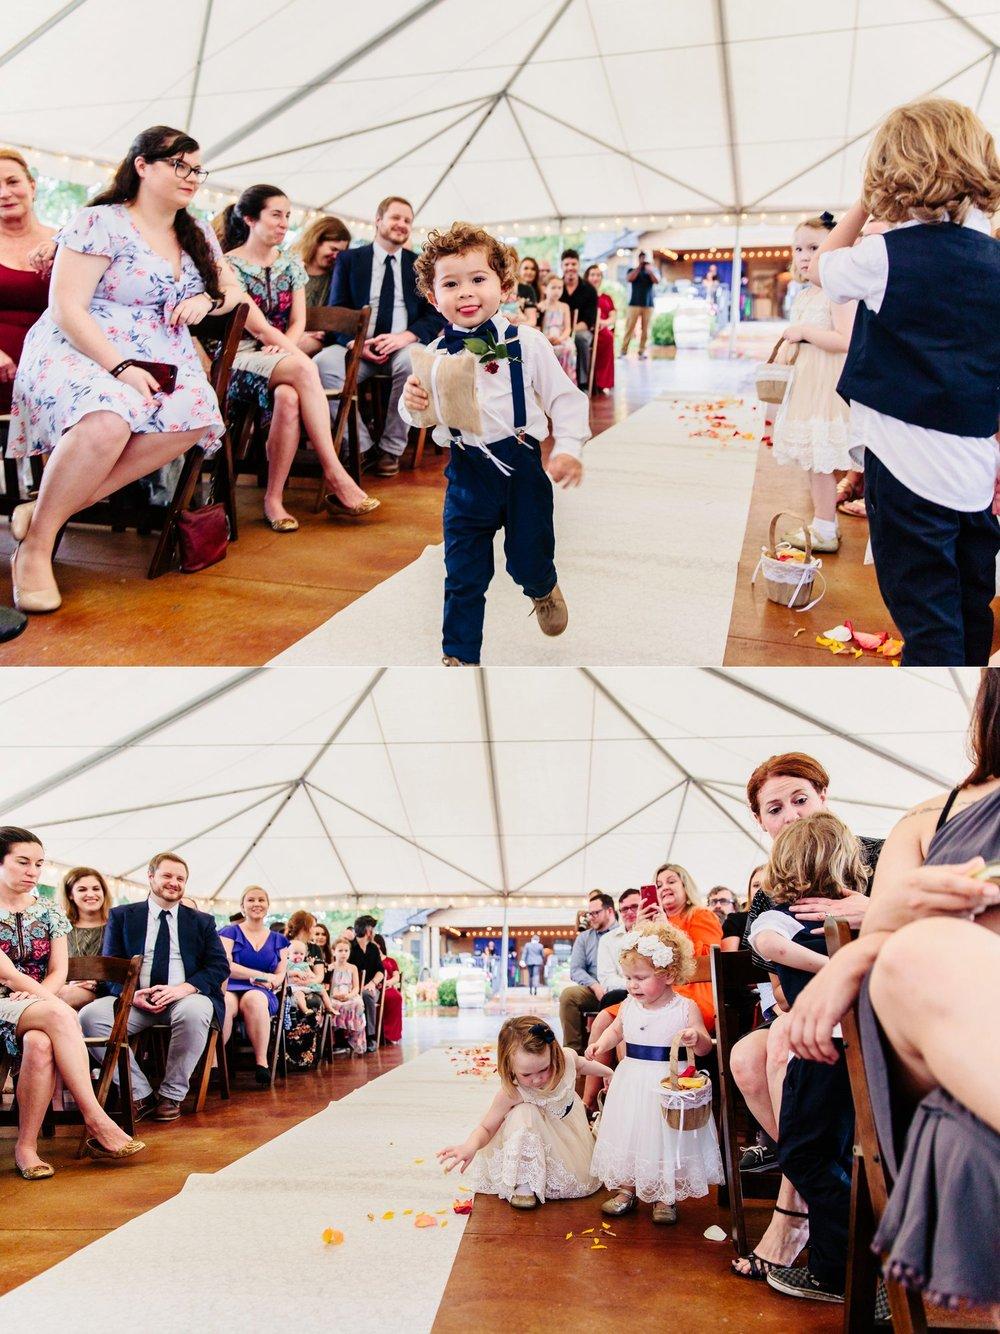 CK-Photo-arrington-wedding_0013.jpg